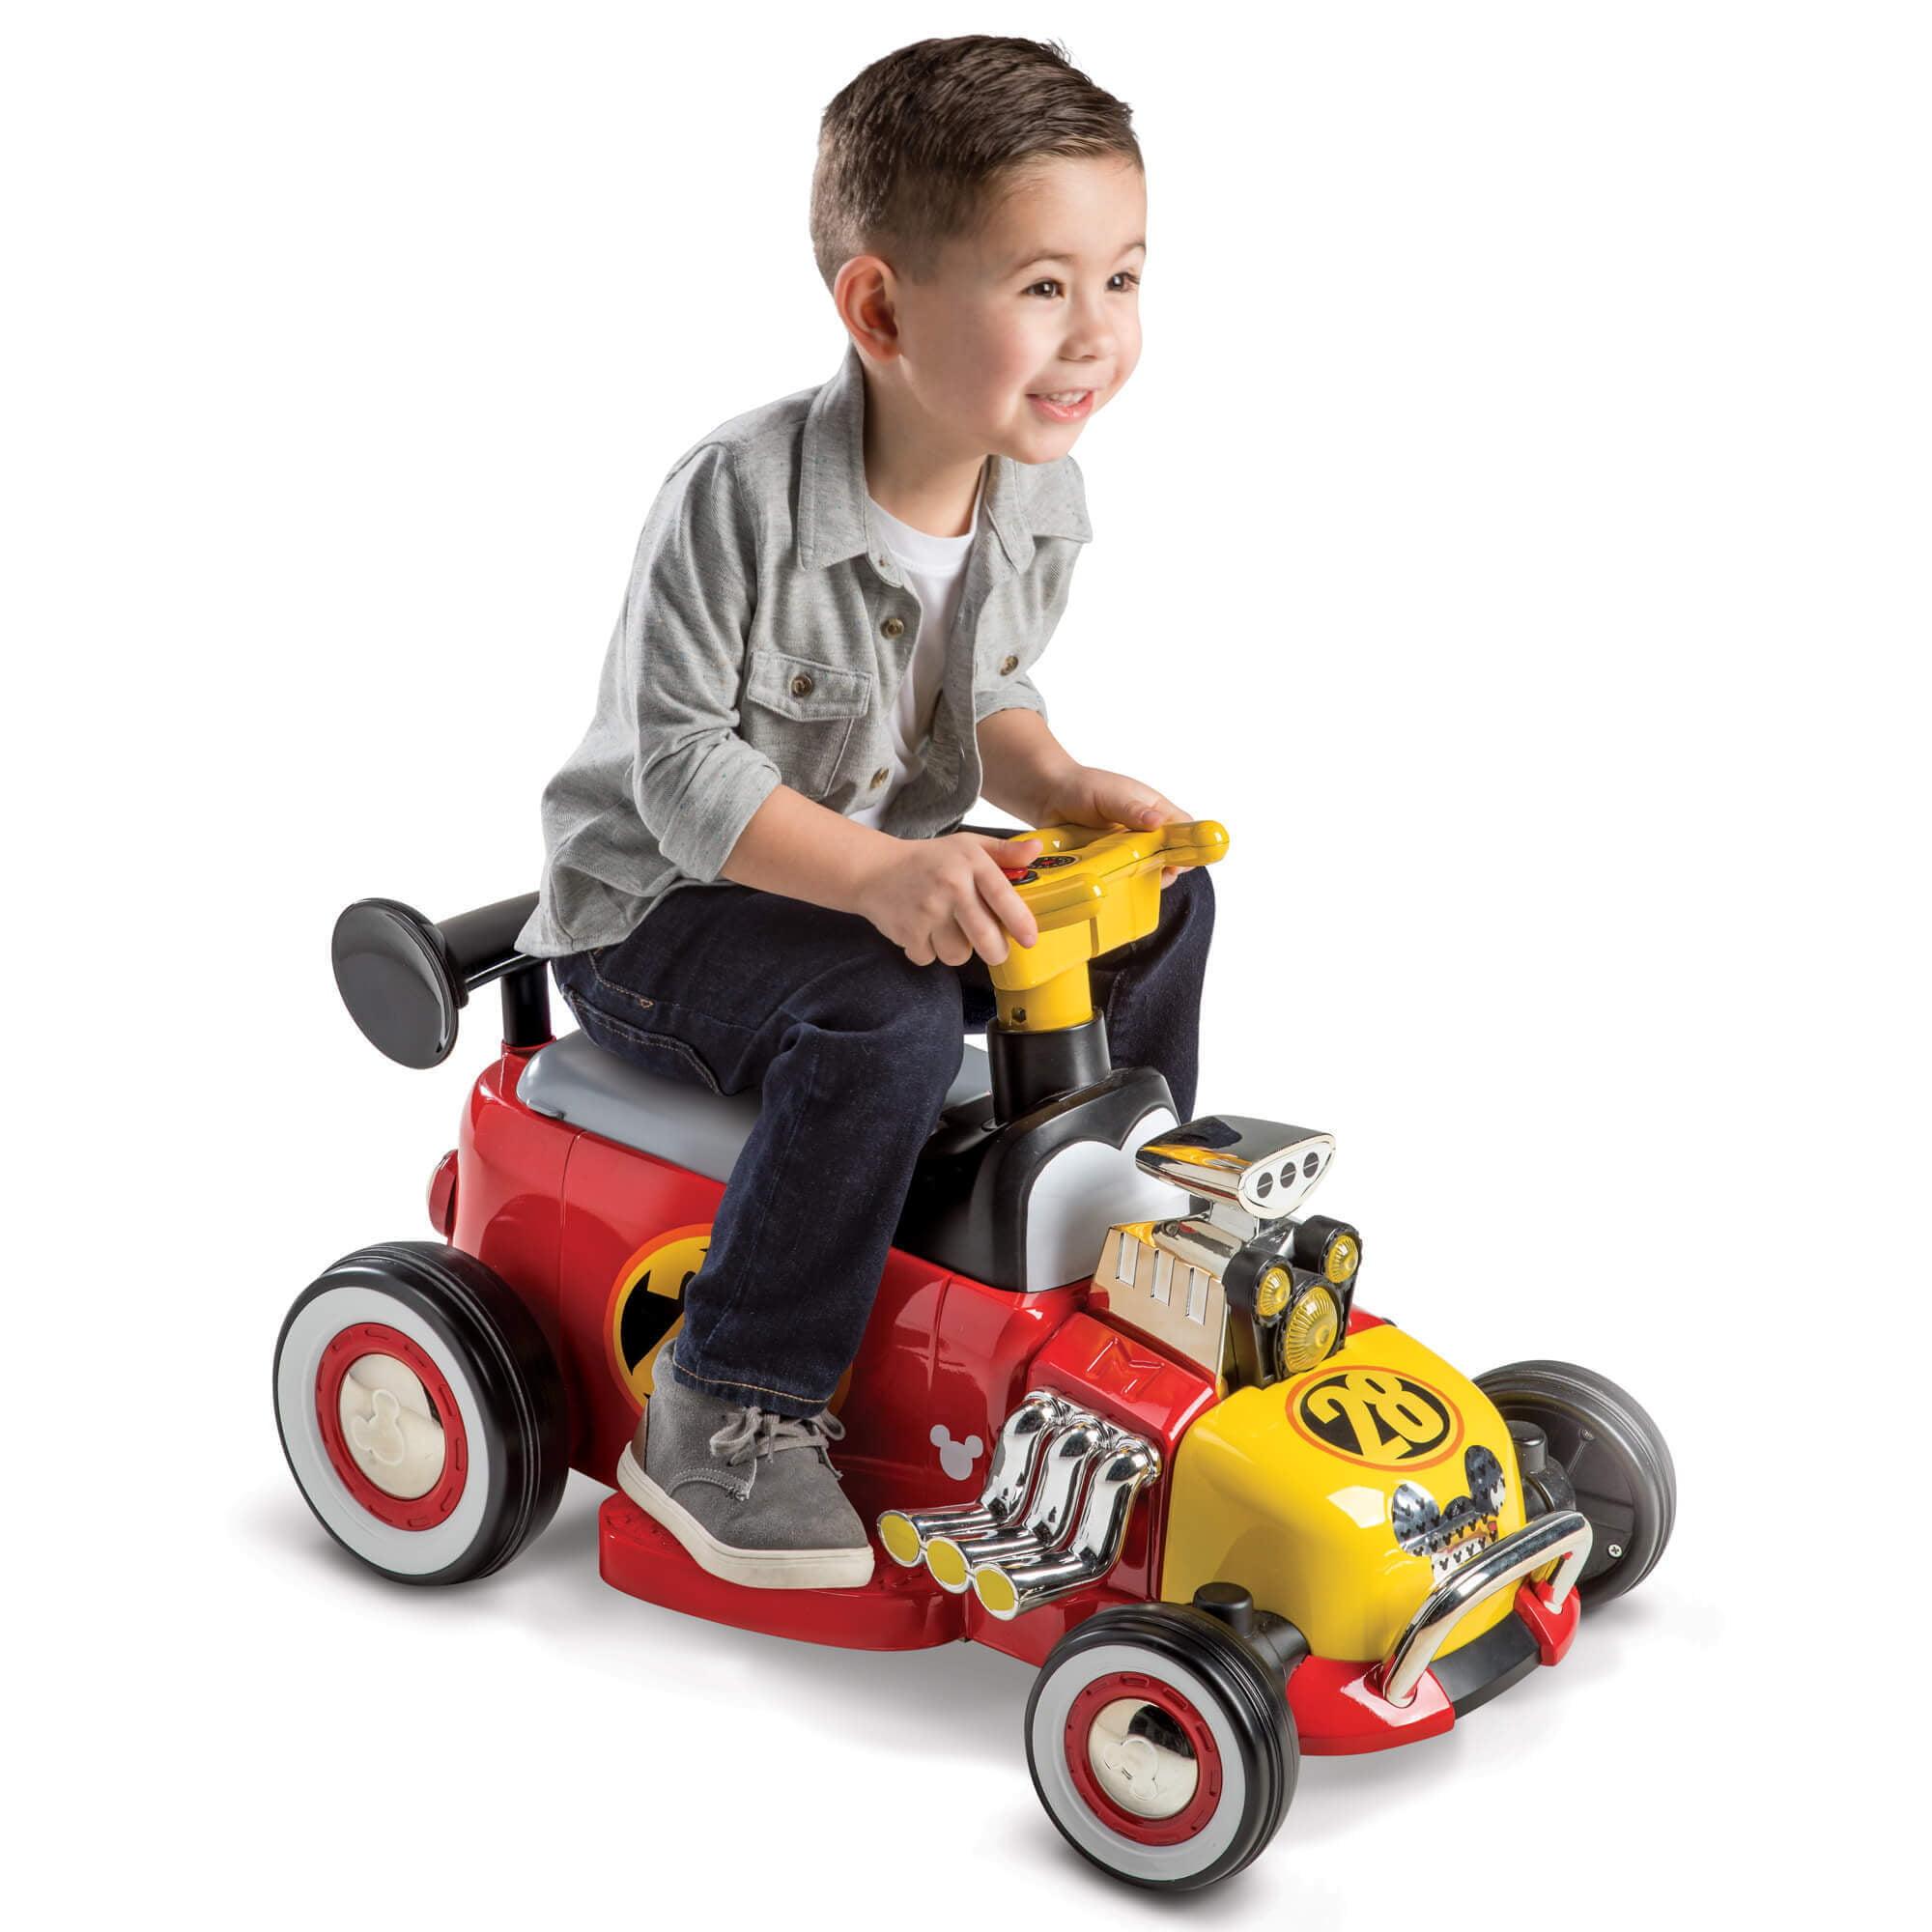 Disney Mickey Boys' 6V Battery-Powered Ride-On Quad by Huffy